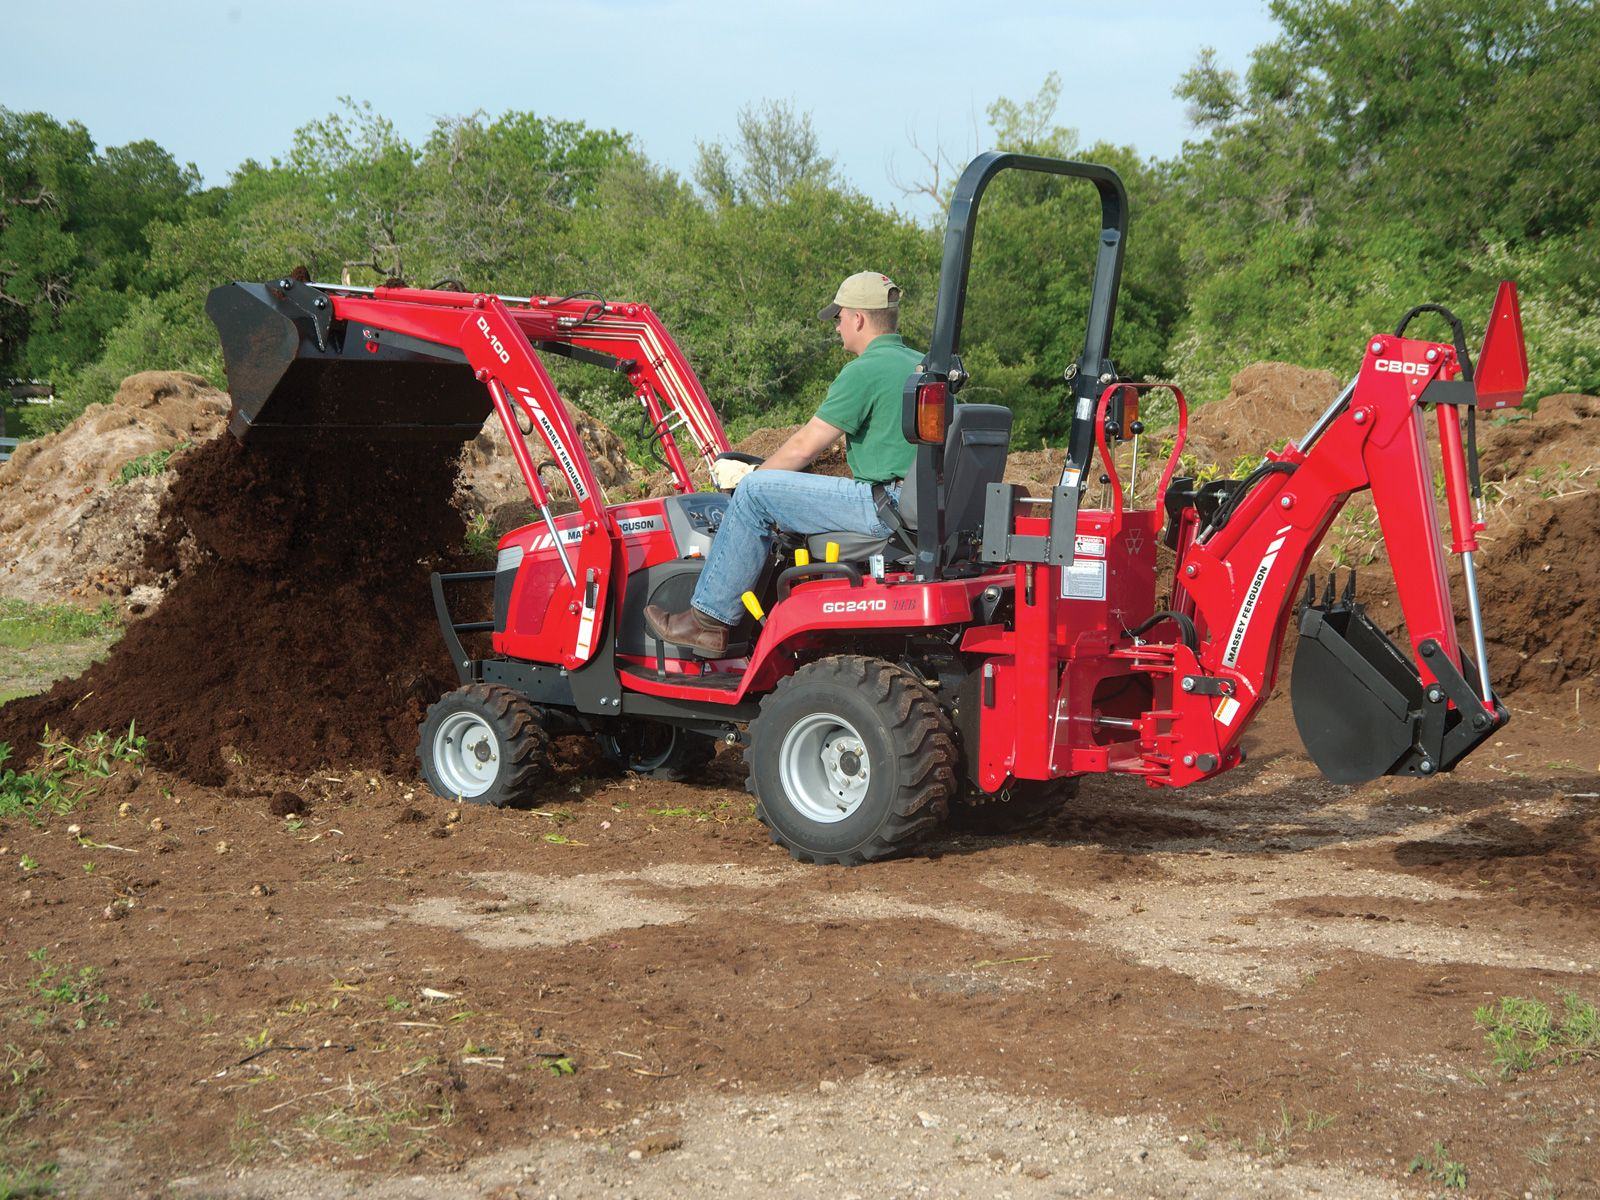 Massey Ferguson Gc Series Sub Compact Tractor